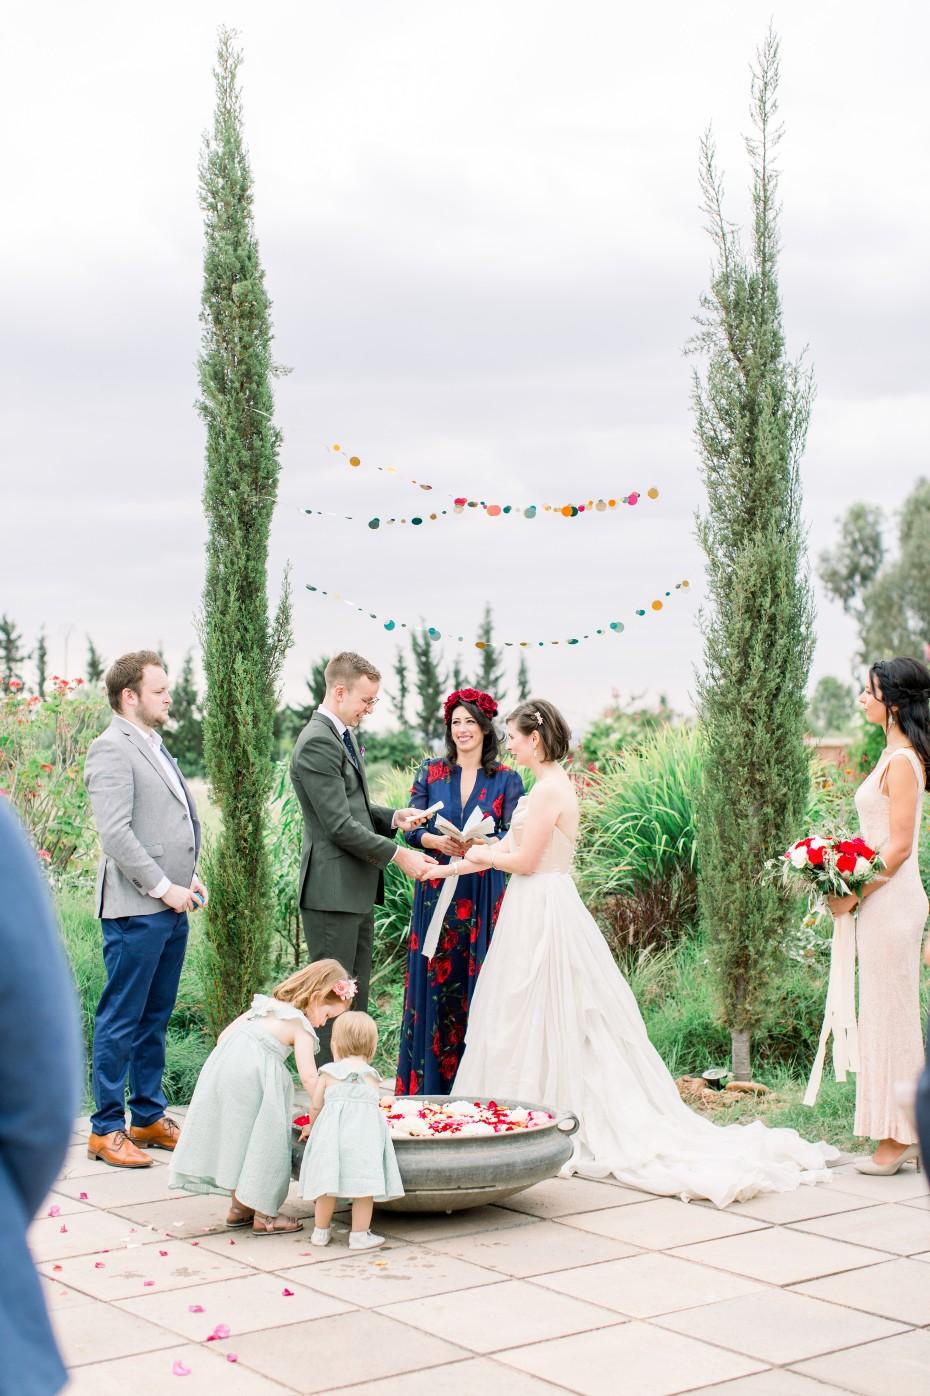 Dianne-Etienne-Morocco-Wedding-298.jpg